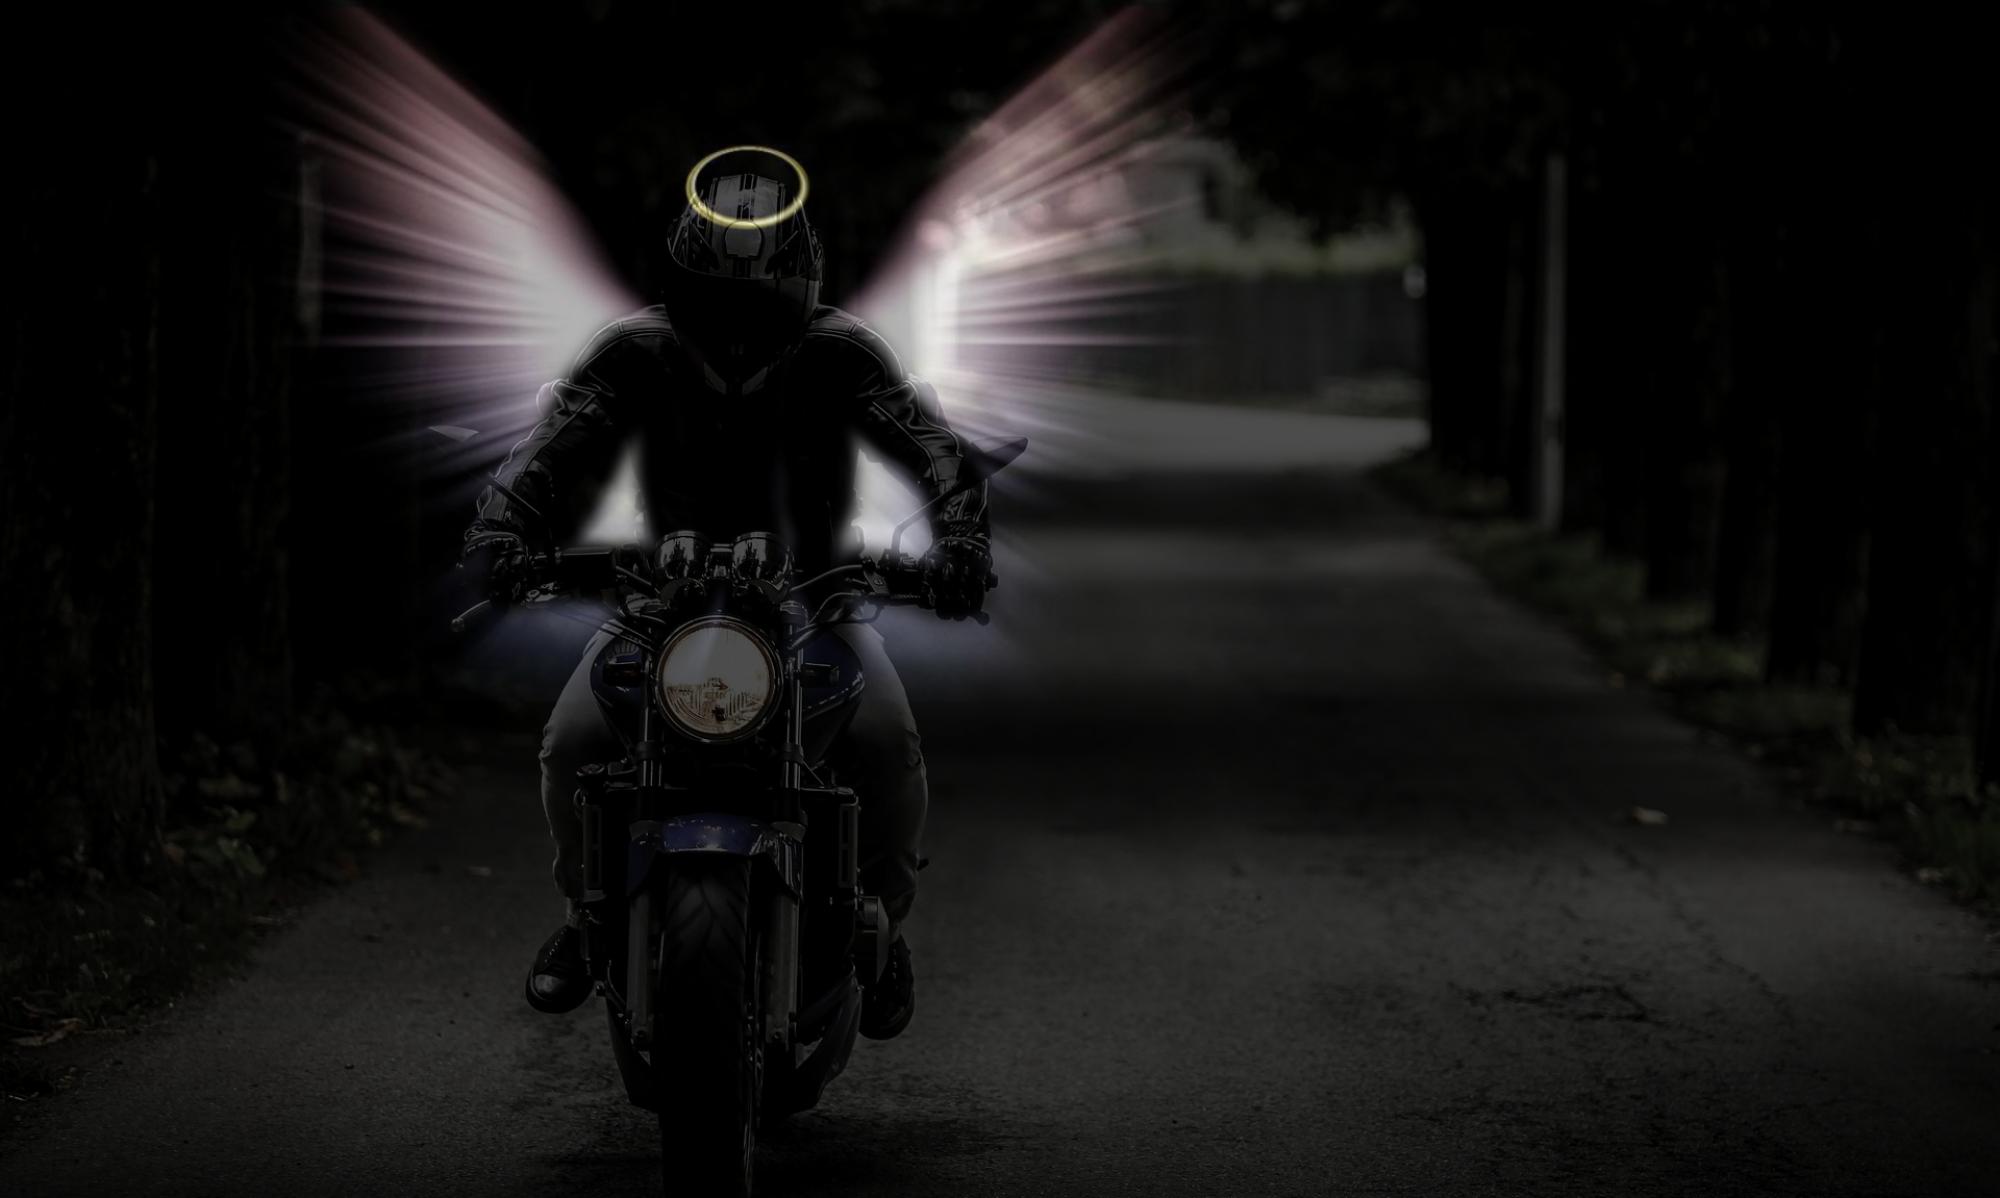 Motoros angyal